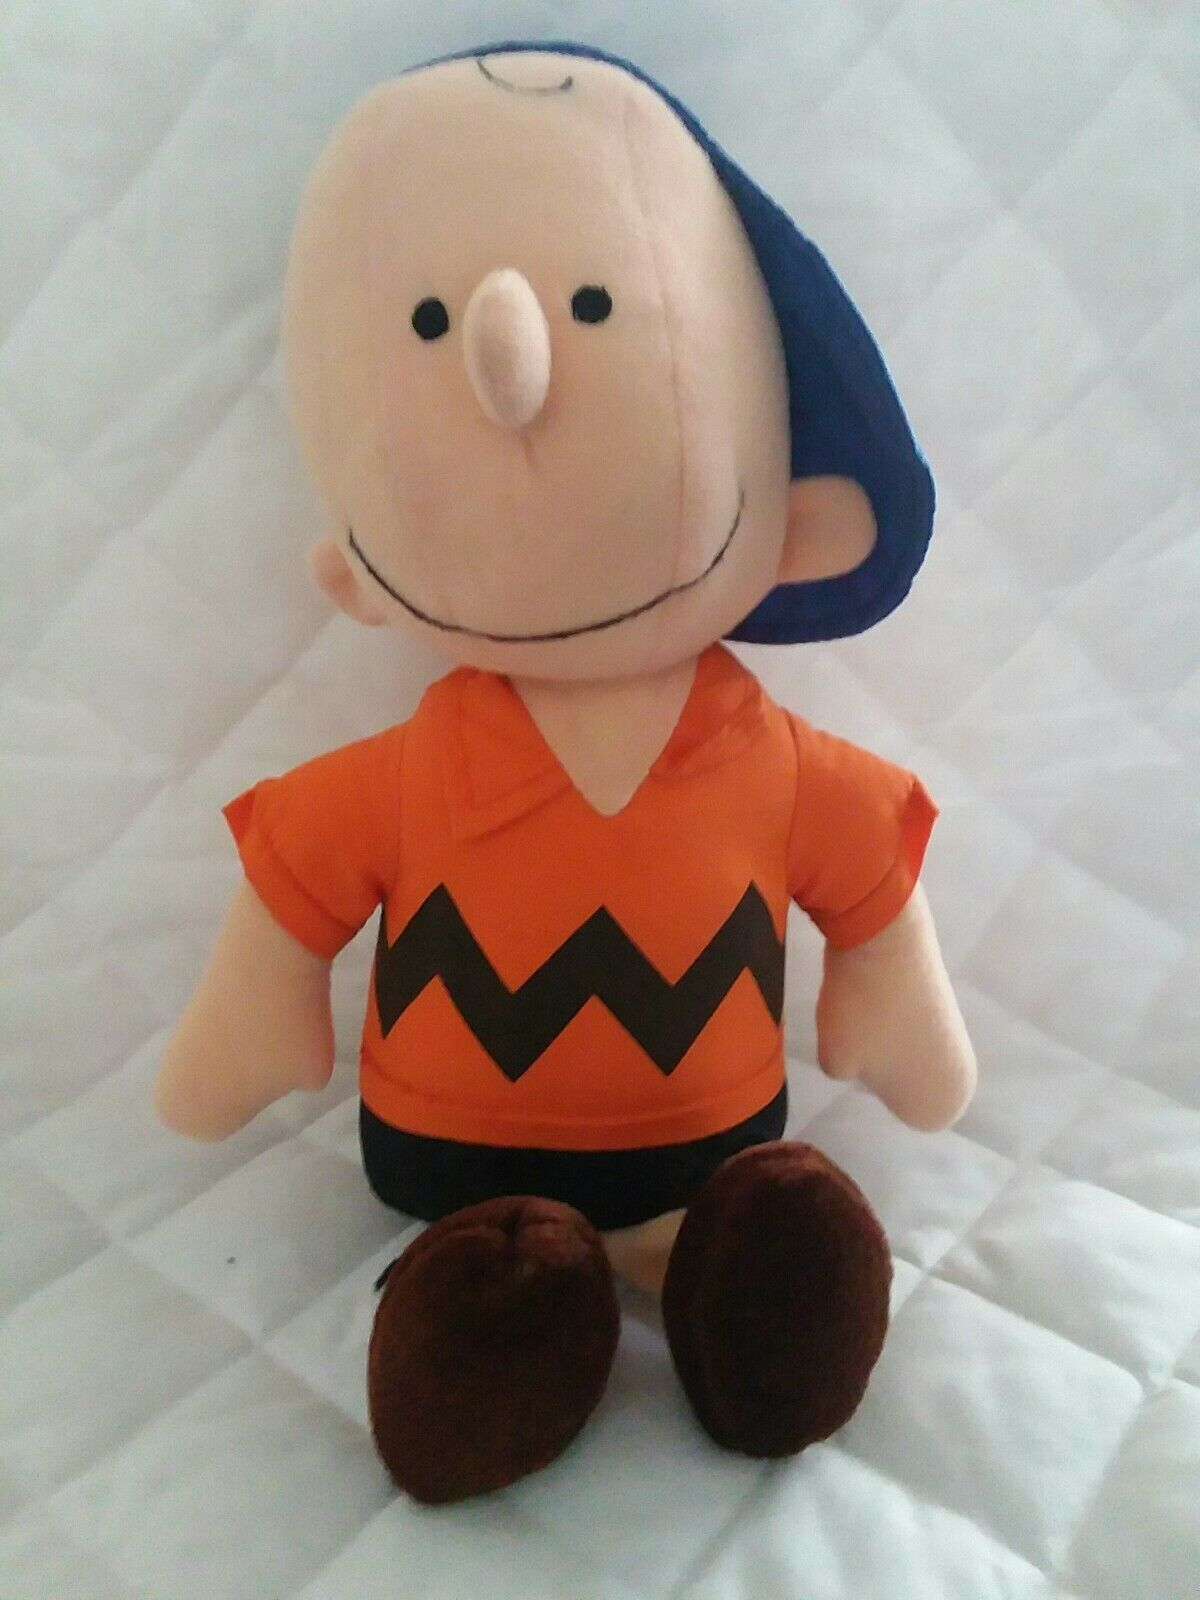 Vintage 13  Peanuts Charlie Brown Plush Plush Plush Doll 1966 United Feature Syndicate Inc. 6835d8